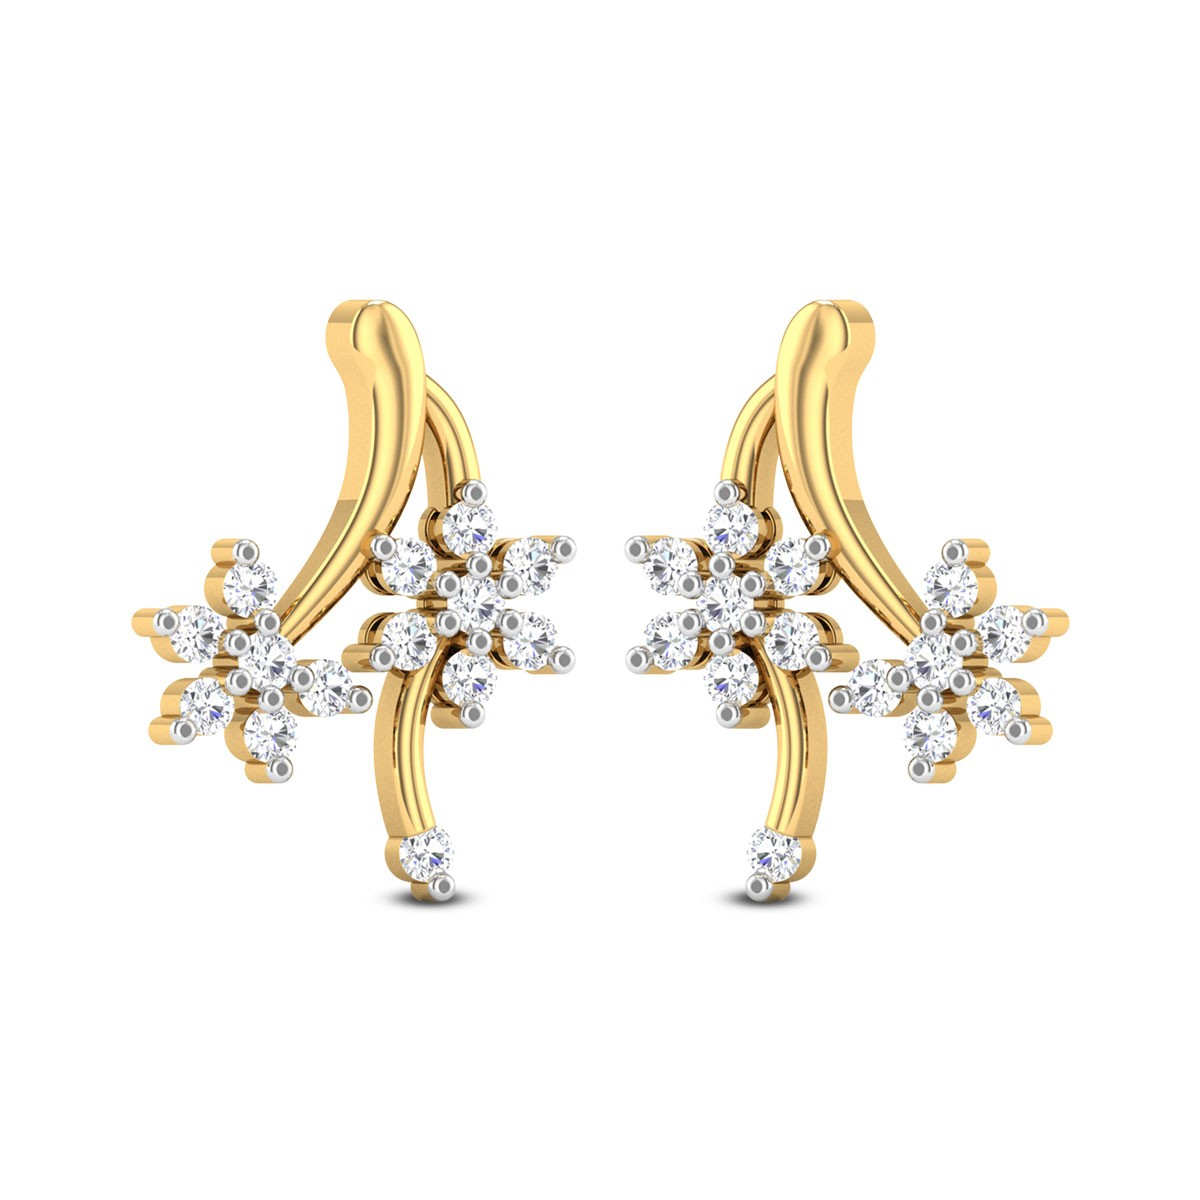 Benton Floral Diamond Stud Earrings